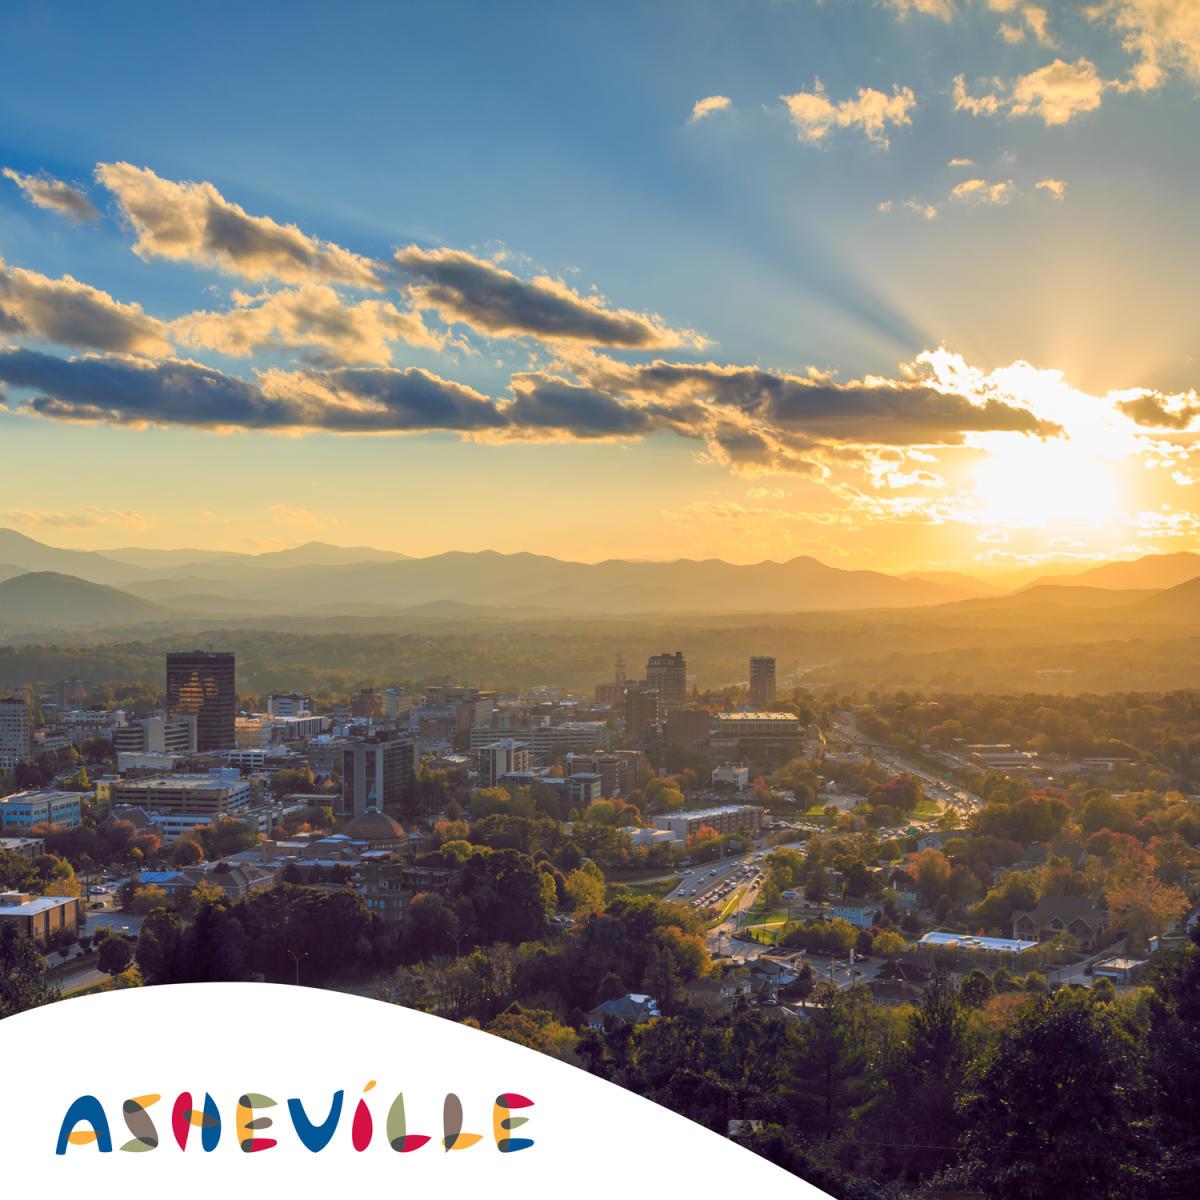 Personals Asheville